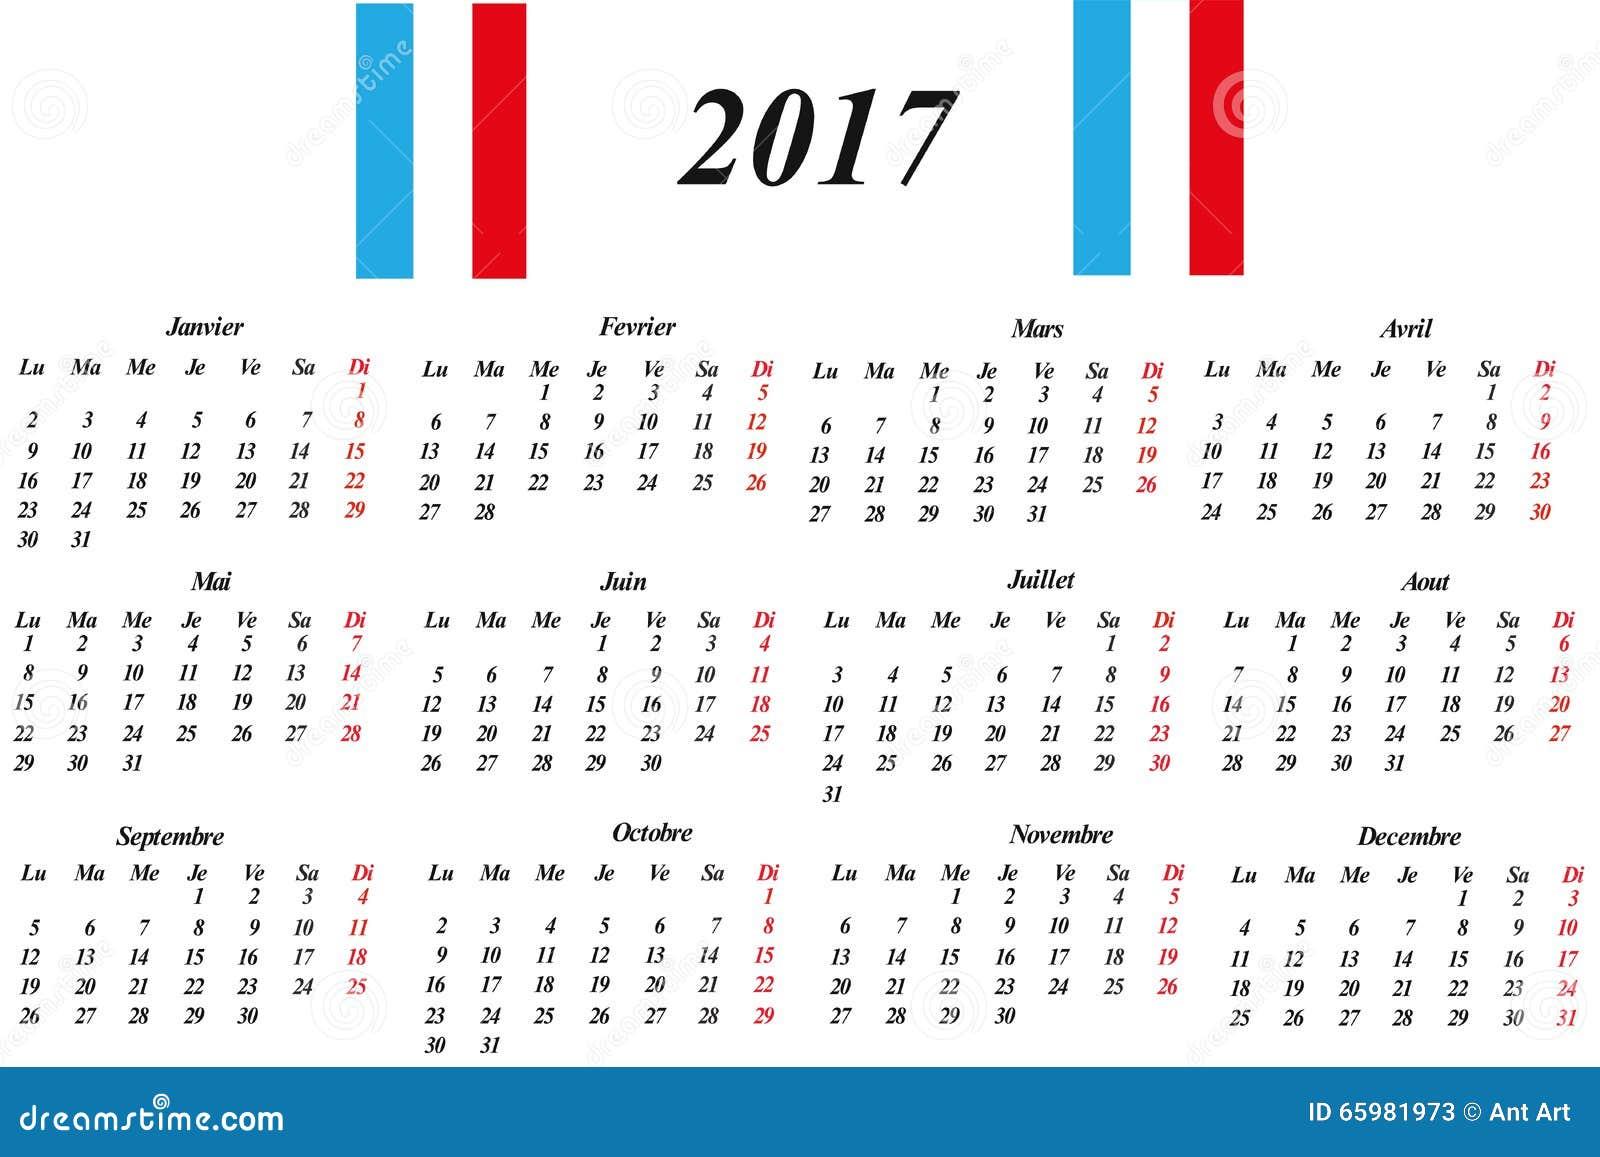 2016 2017 Calendar With Holidays | Calendar Template 2016